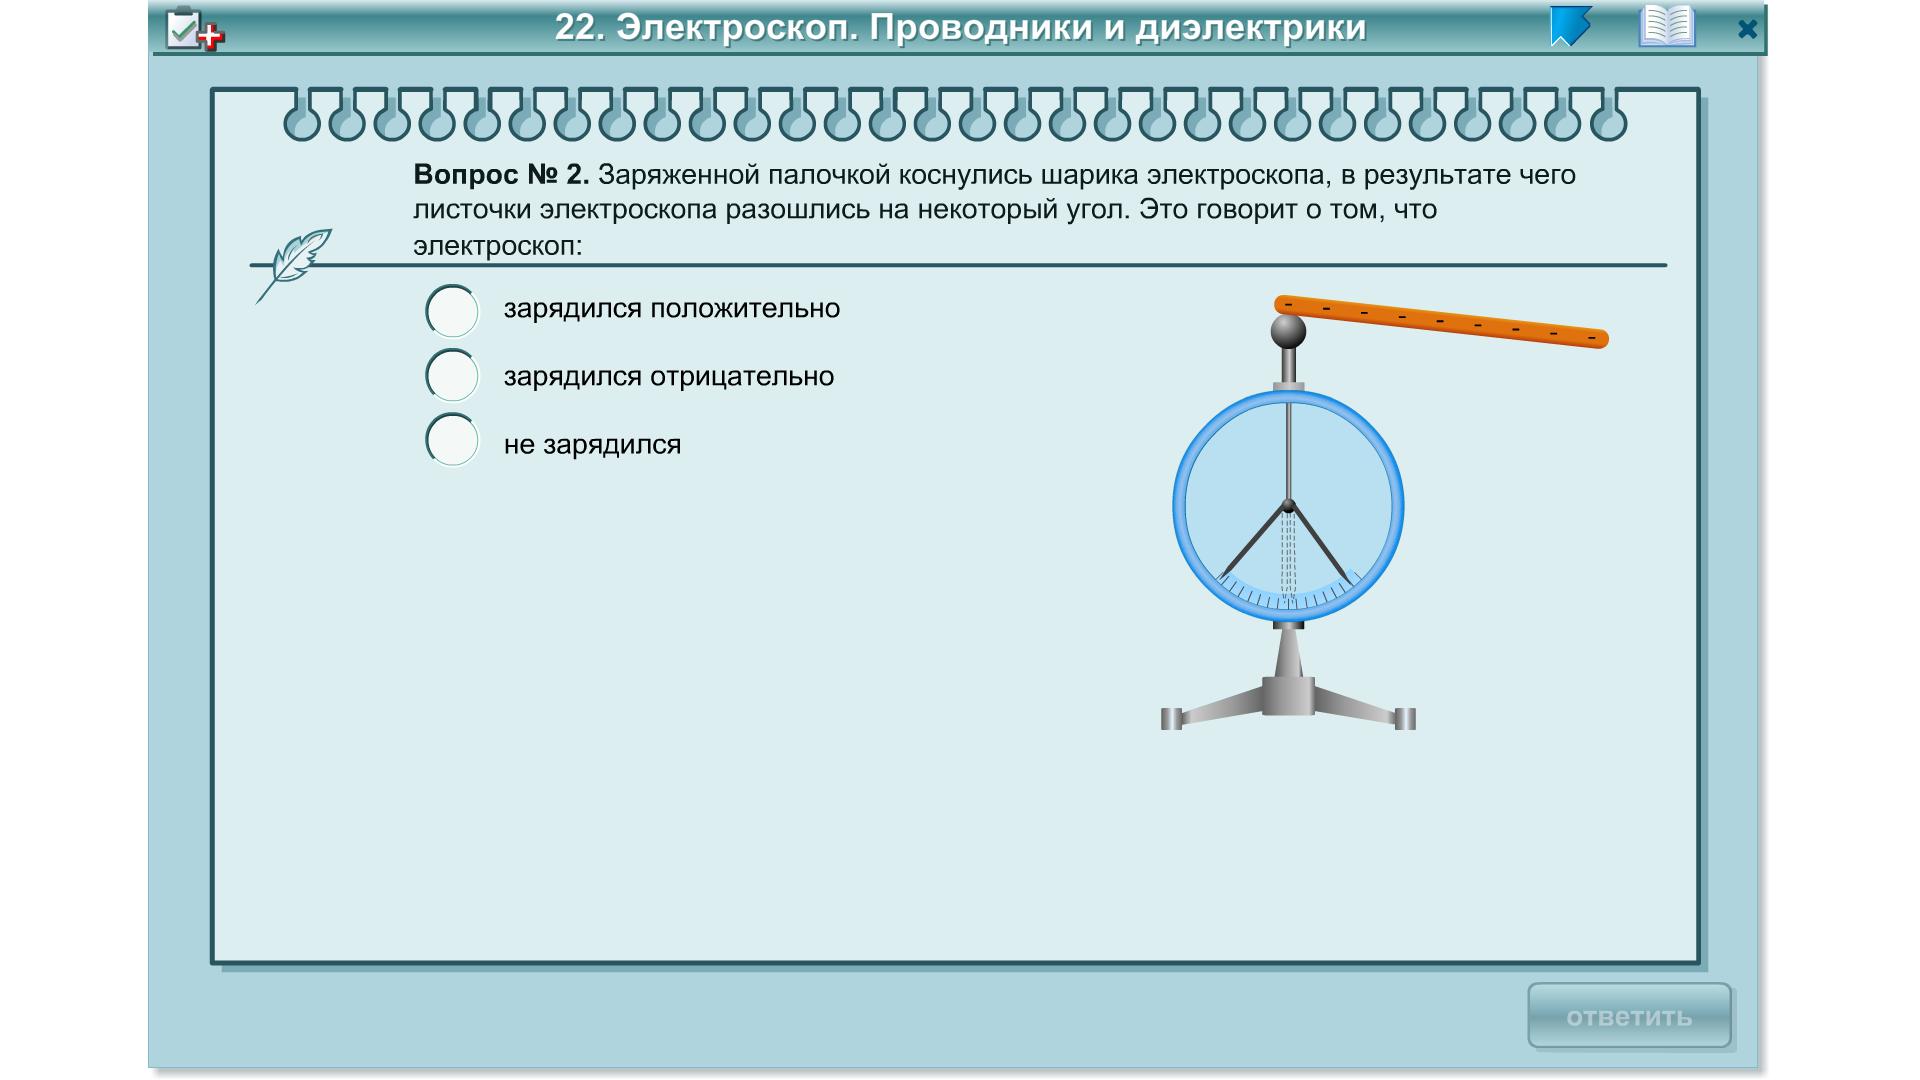 рисунком устройство электроскопа с